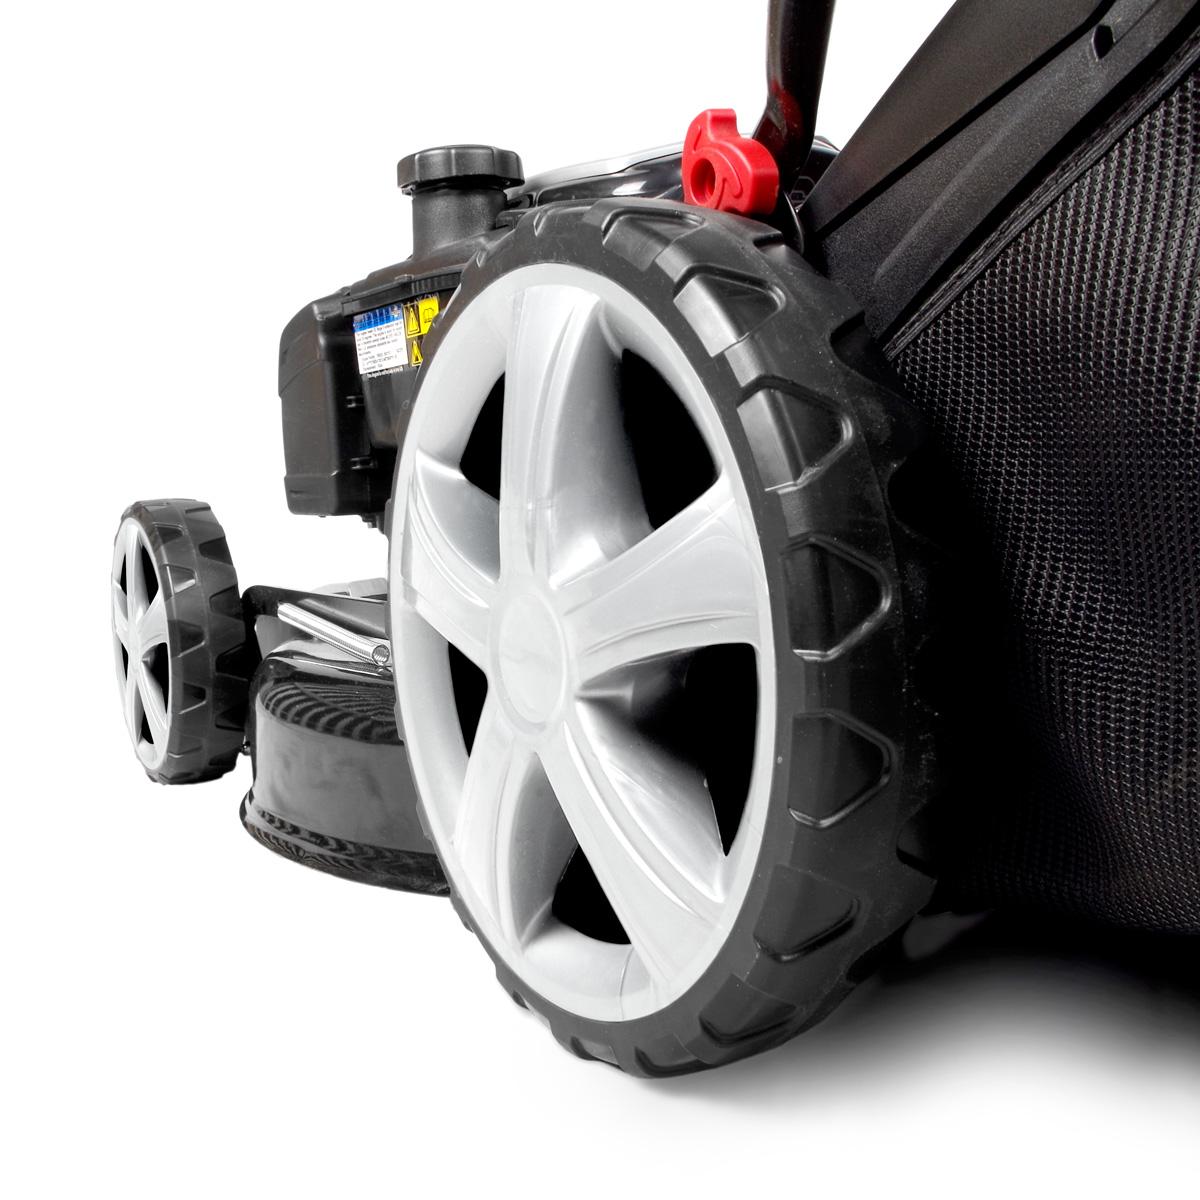 brast benzin rasenm her 4 4kw 6ps elektrostart selbstantrieb gt markengetriebe ebay. Black Bedroom Furniture Sets. Home Design Ideas